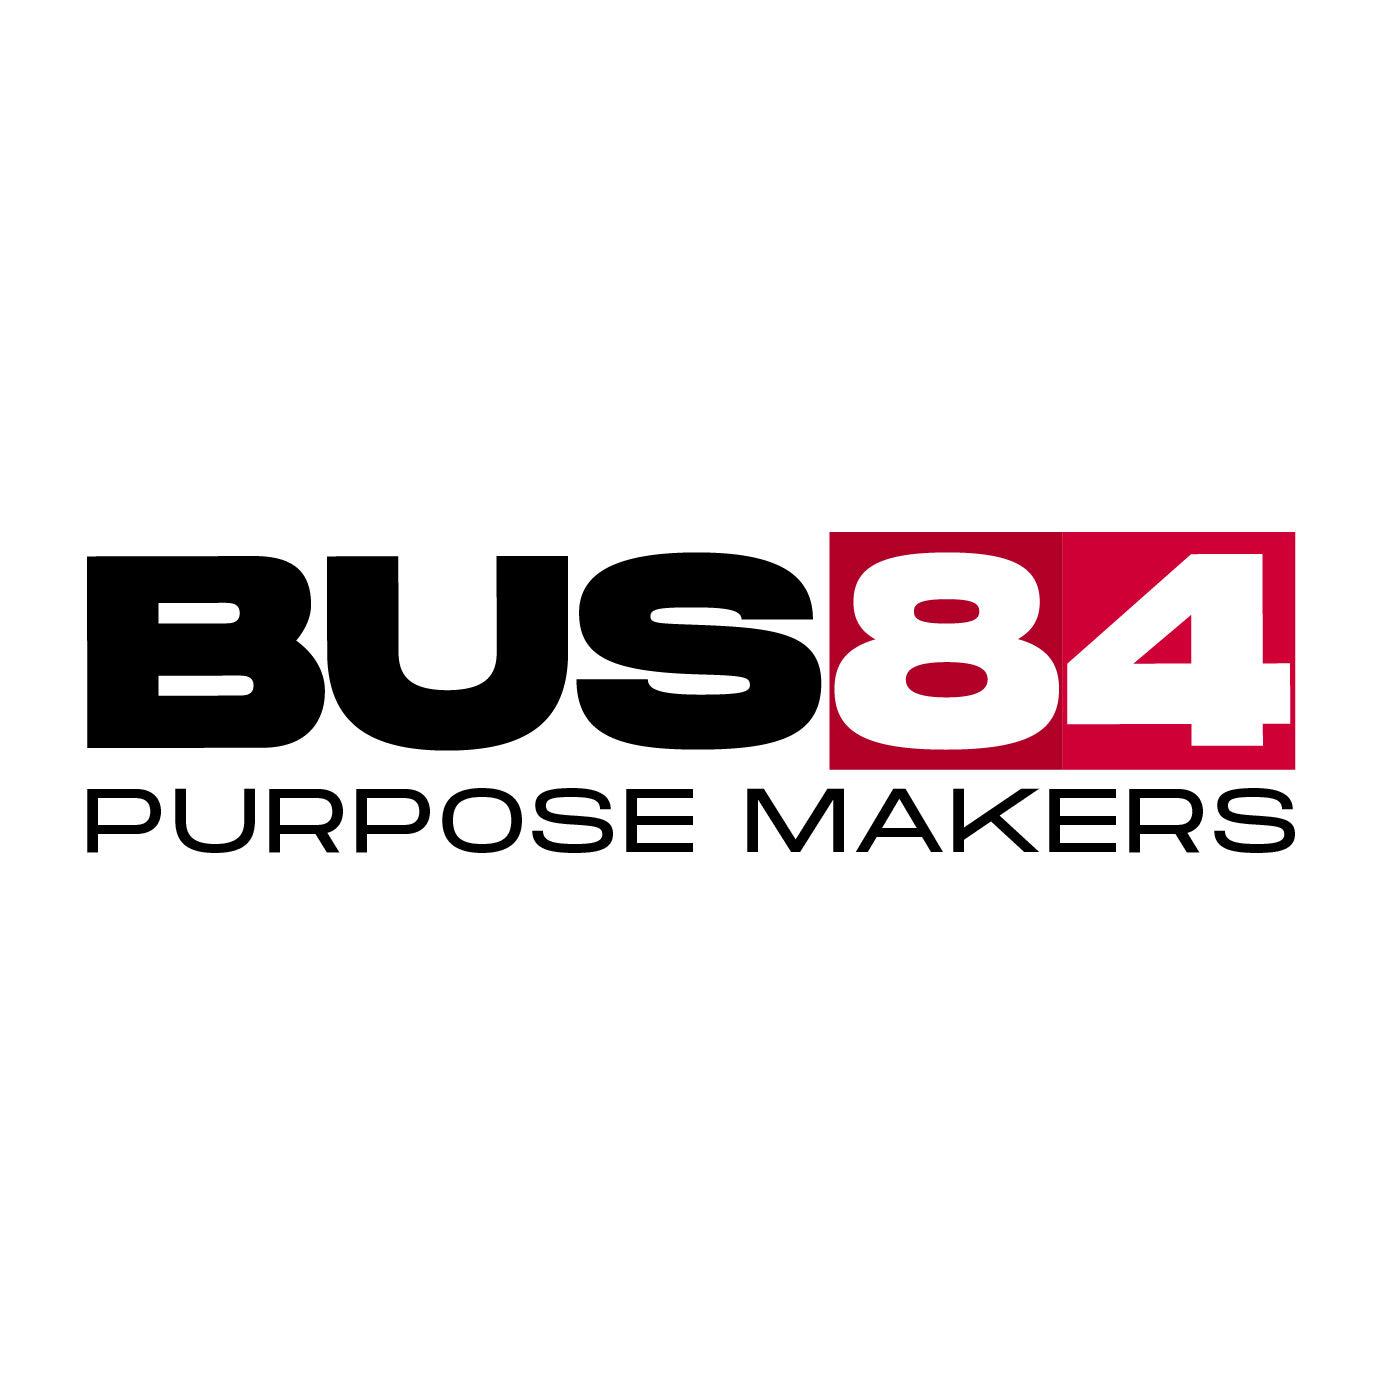 BUS84 agencia con propósito